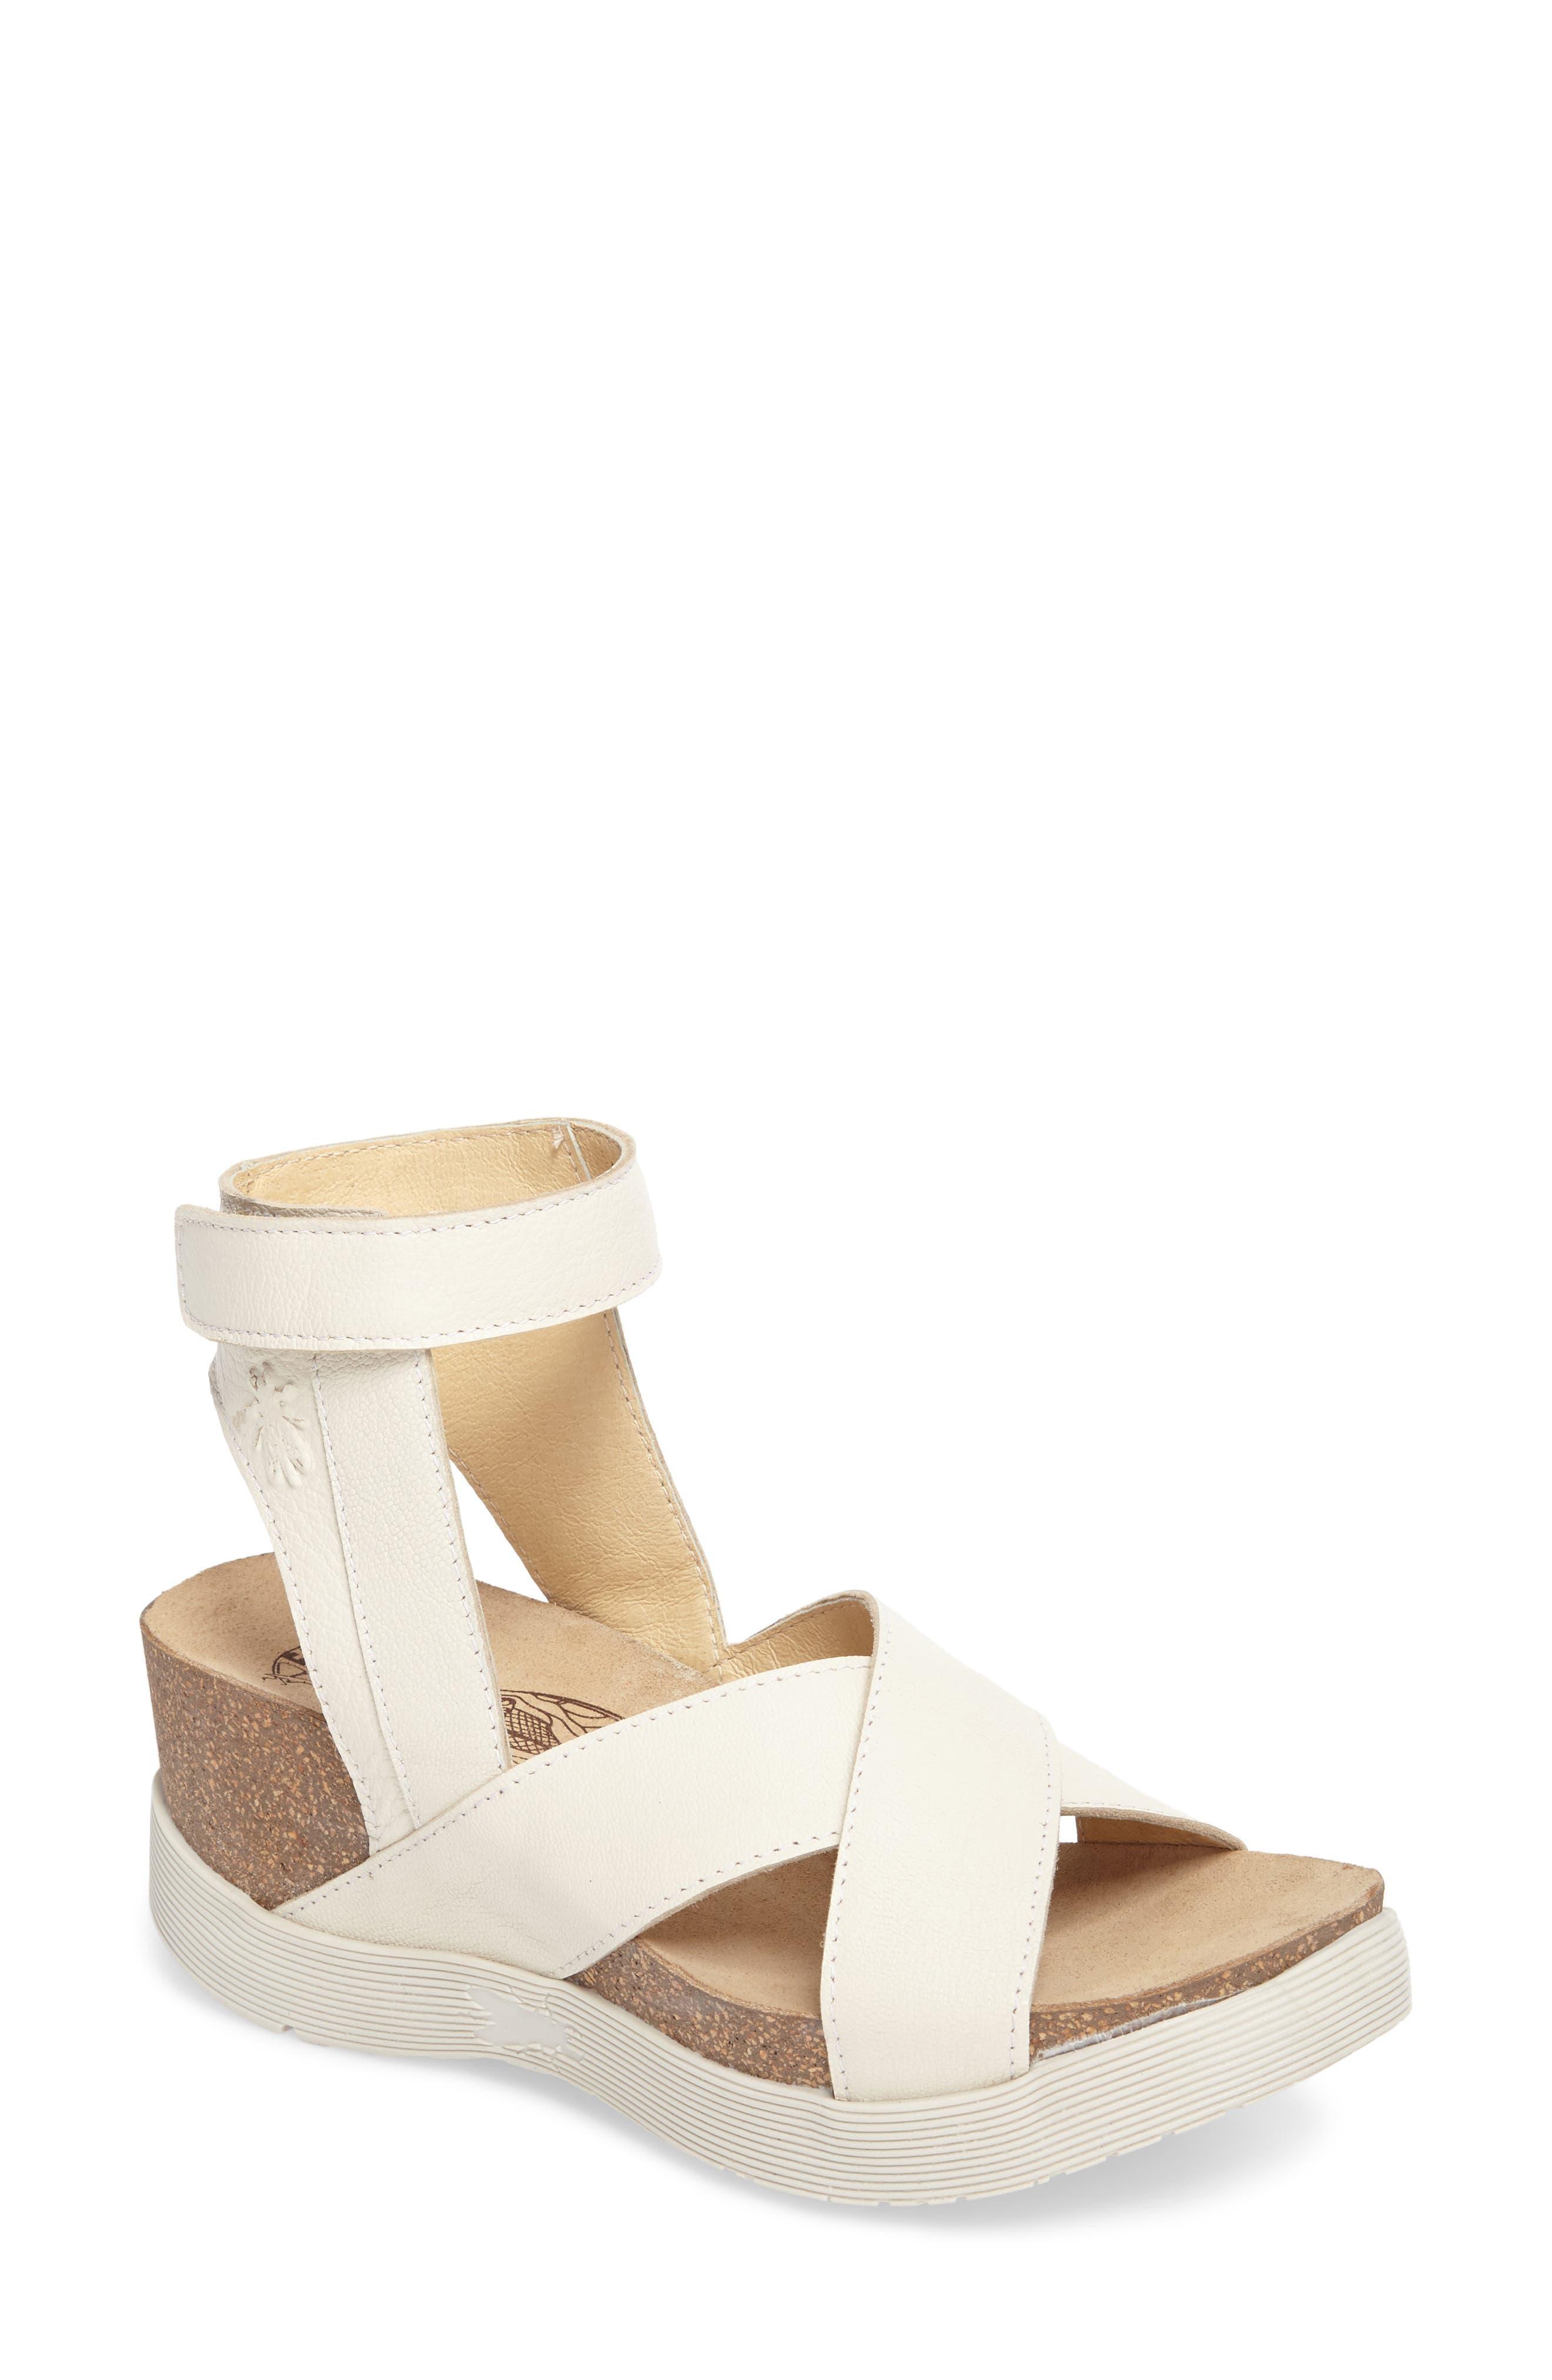 Alternate Image 1 Selected - Fly London Weel Platform Sandal (Women)